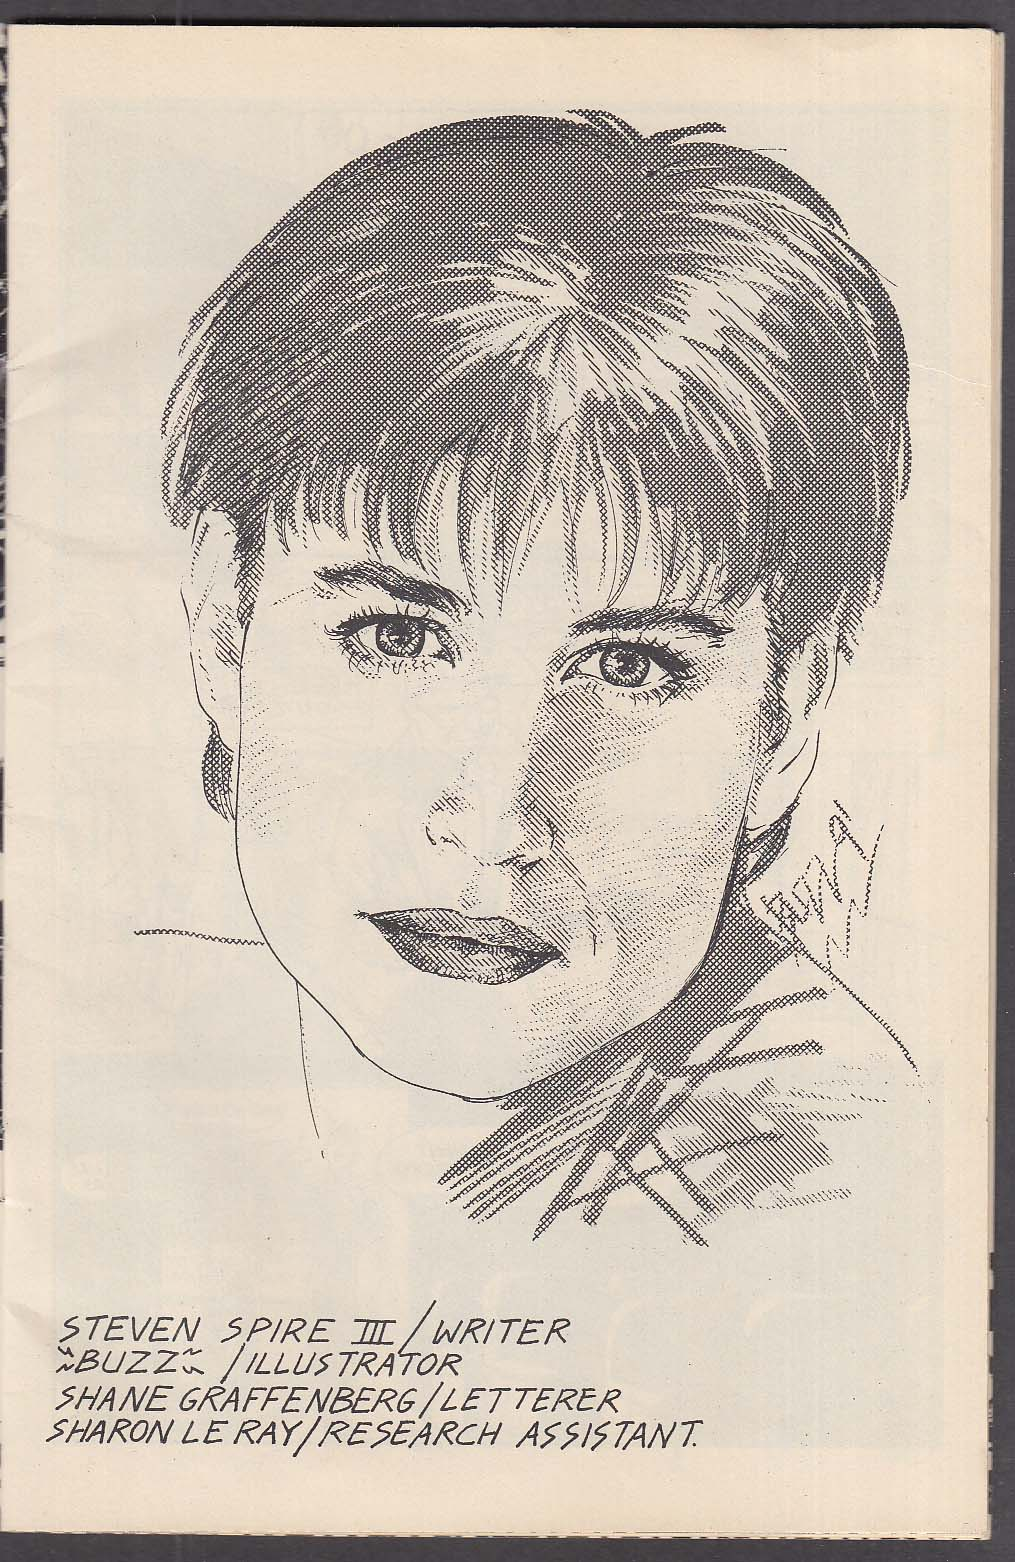 PERSONALITY COMICS PRESENTS Patrick Swayze & Demi Moore comic book 1991